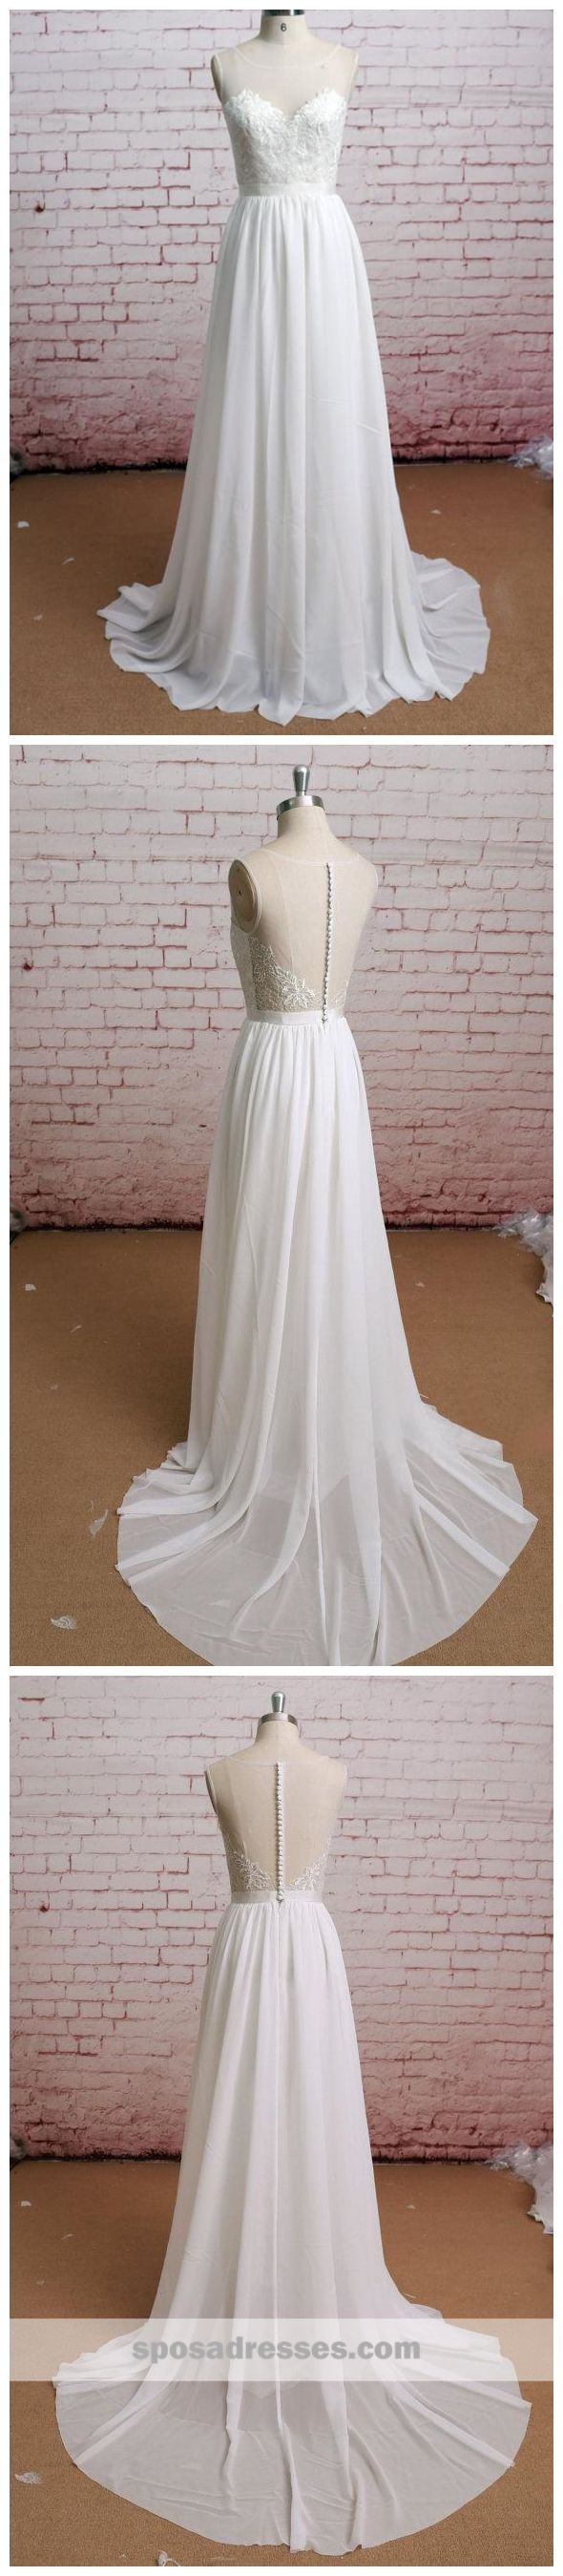 Simple and cheap wedding dresses   best Cheap Wedding Dresses images on Pinterest  Short wedding